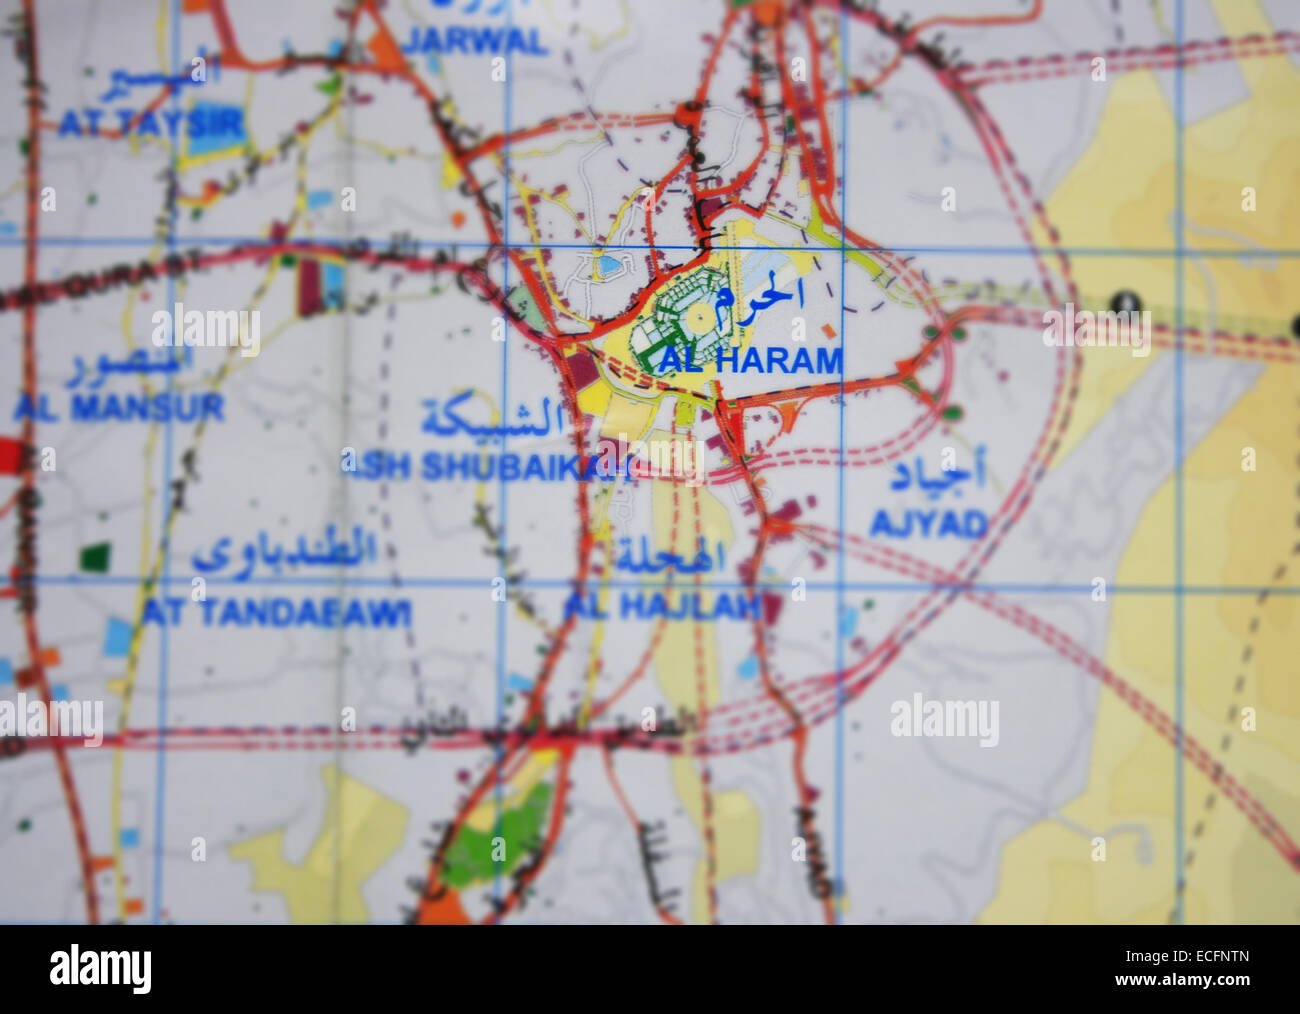 Mecca map and Masjidil Haram in Kingdom of Saudi Arabia Stock Photo ...